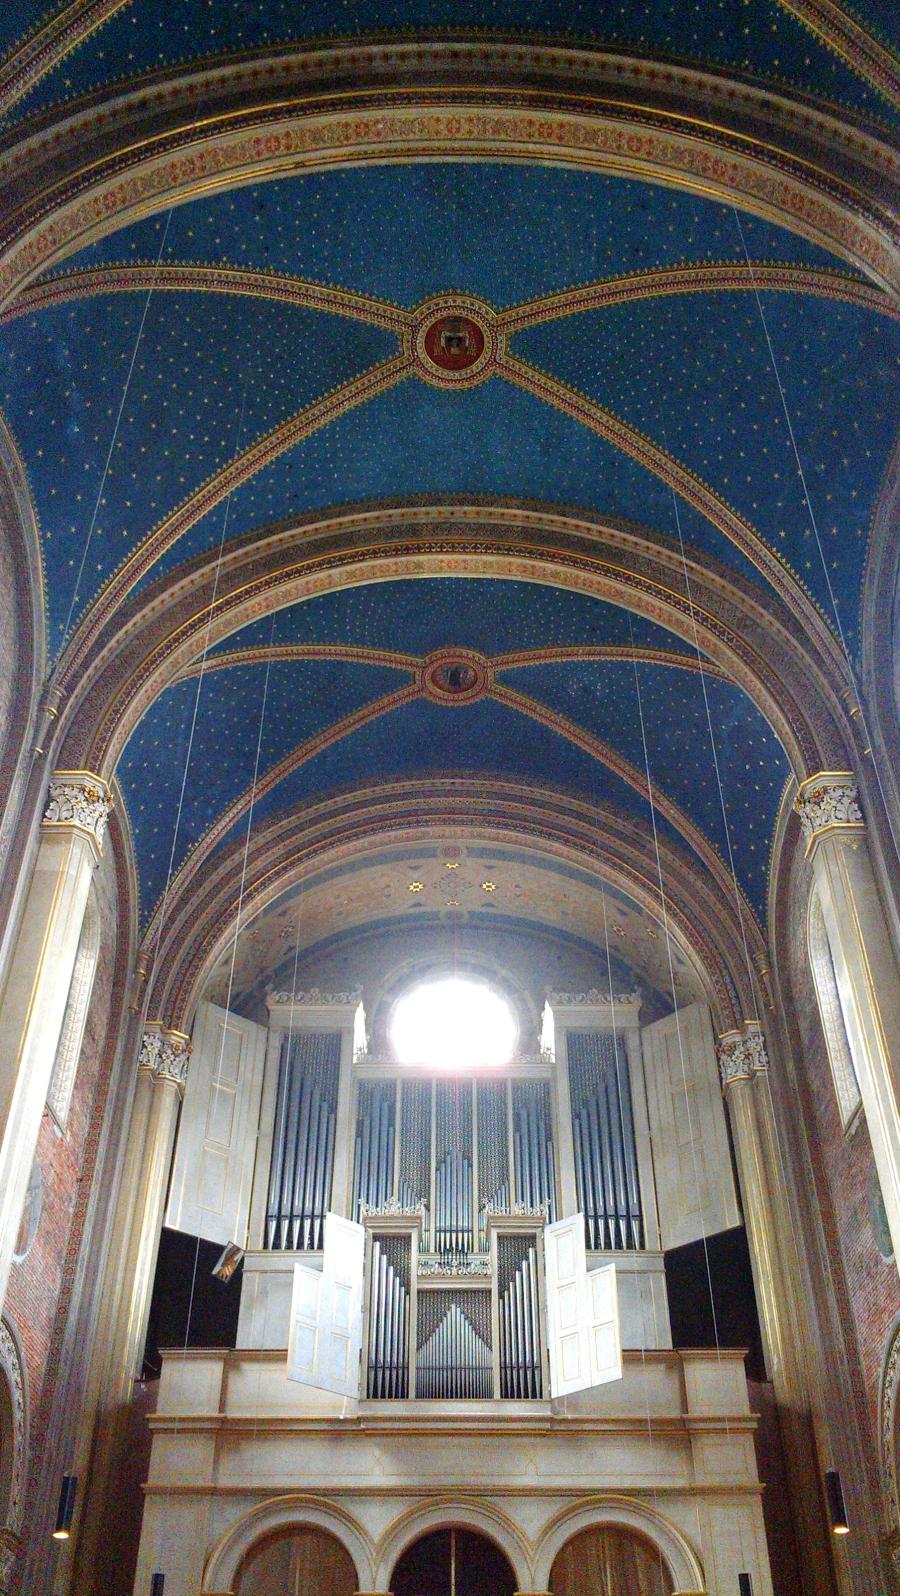 Saint Ludwig's Church, Munich, Germany.